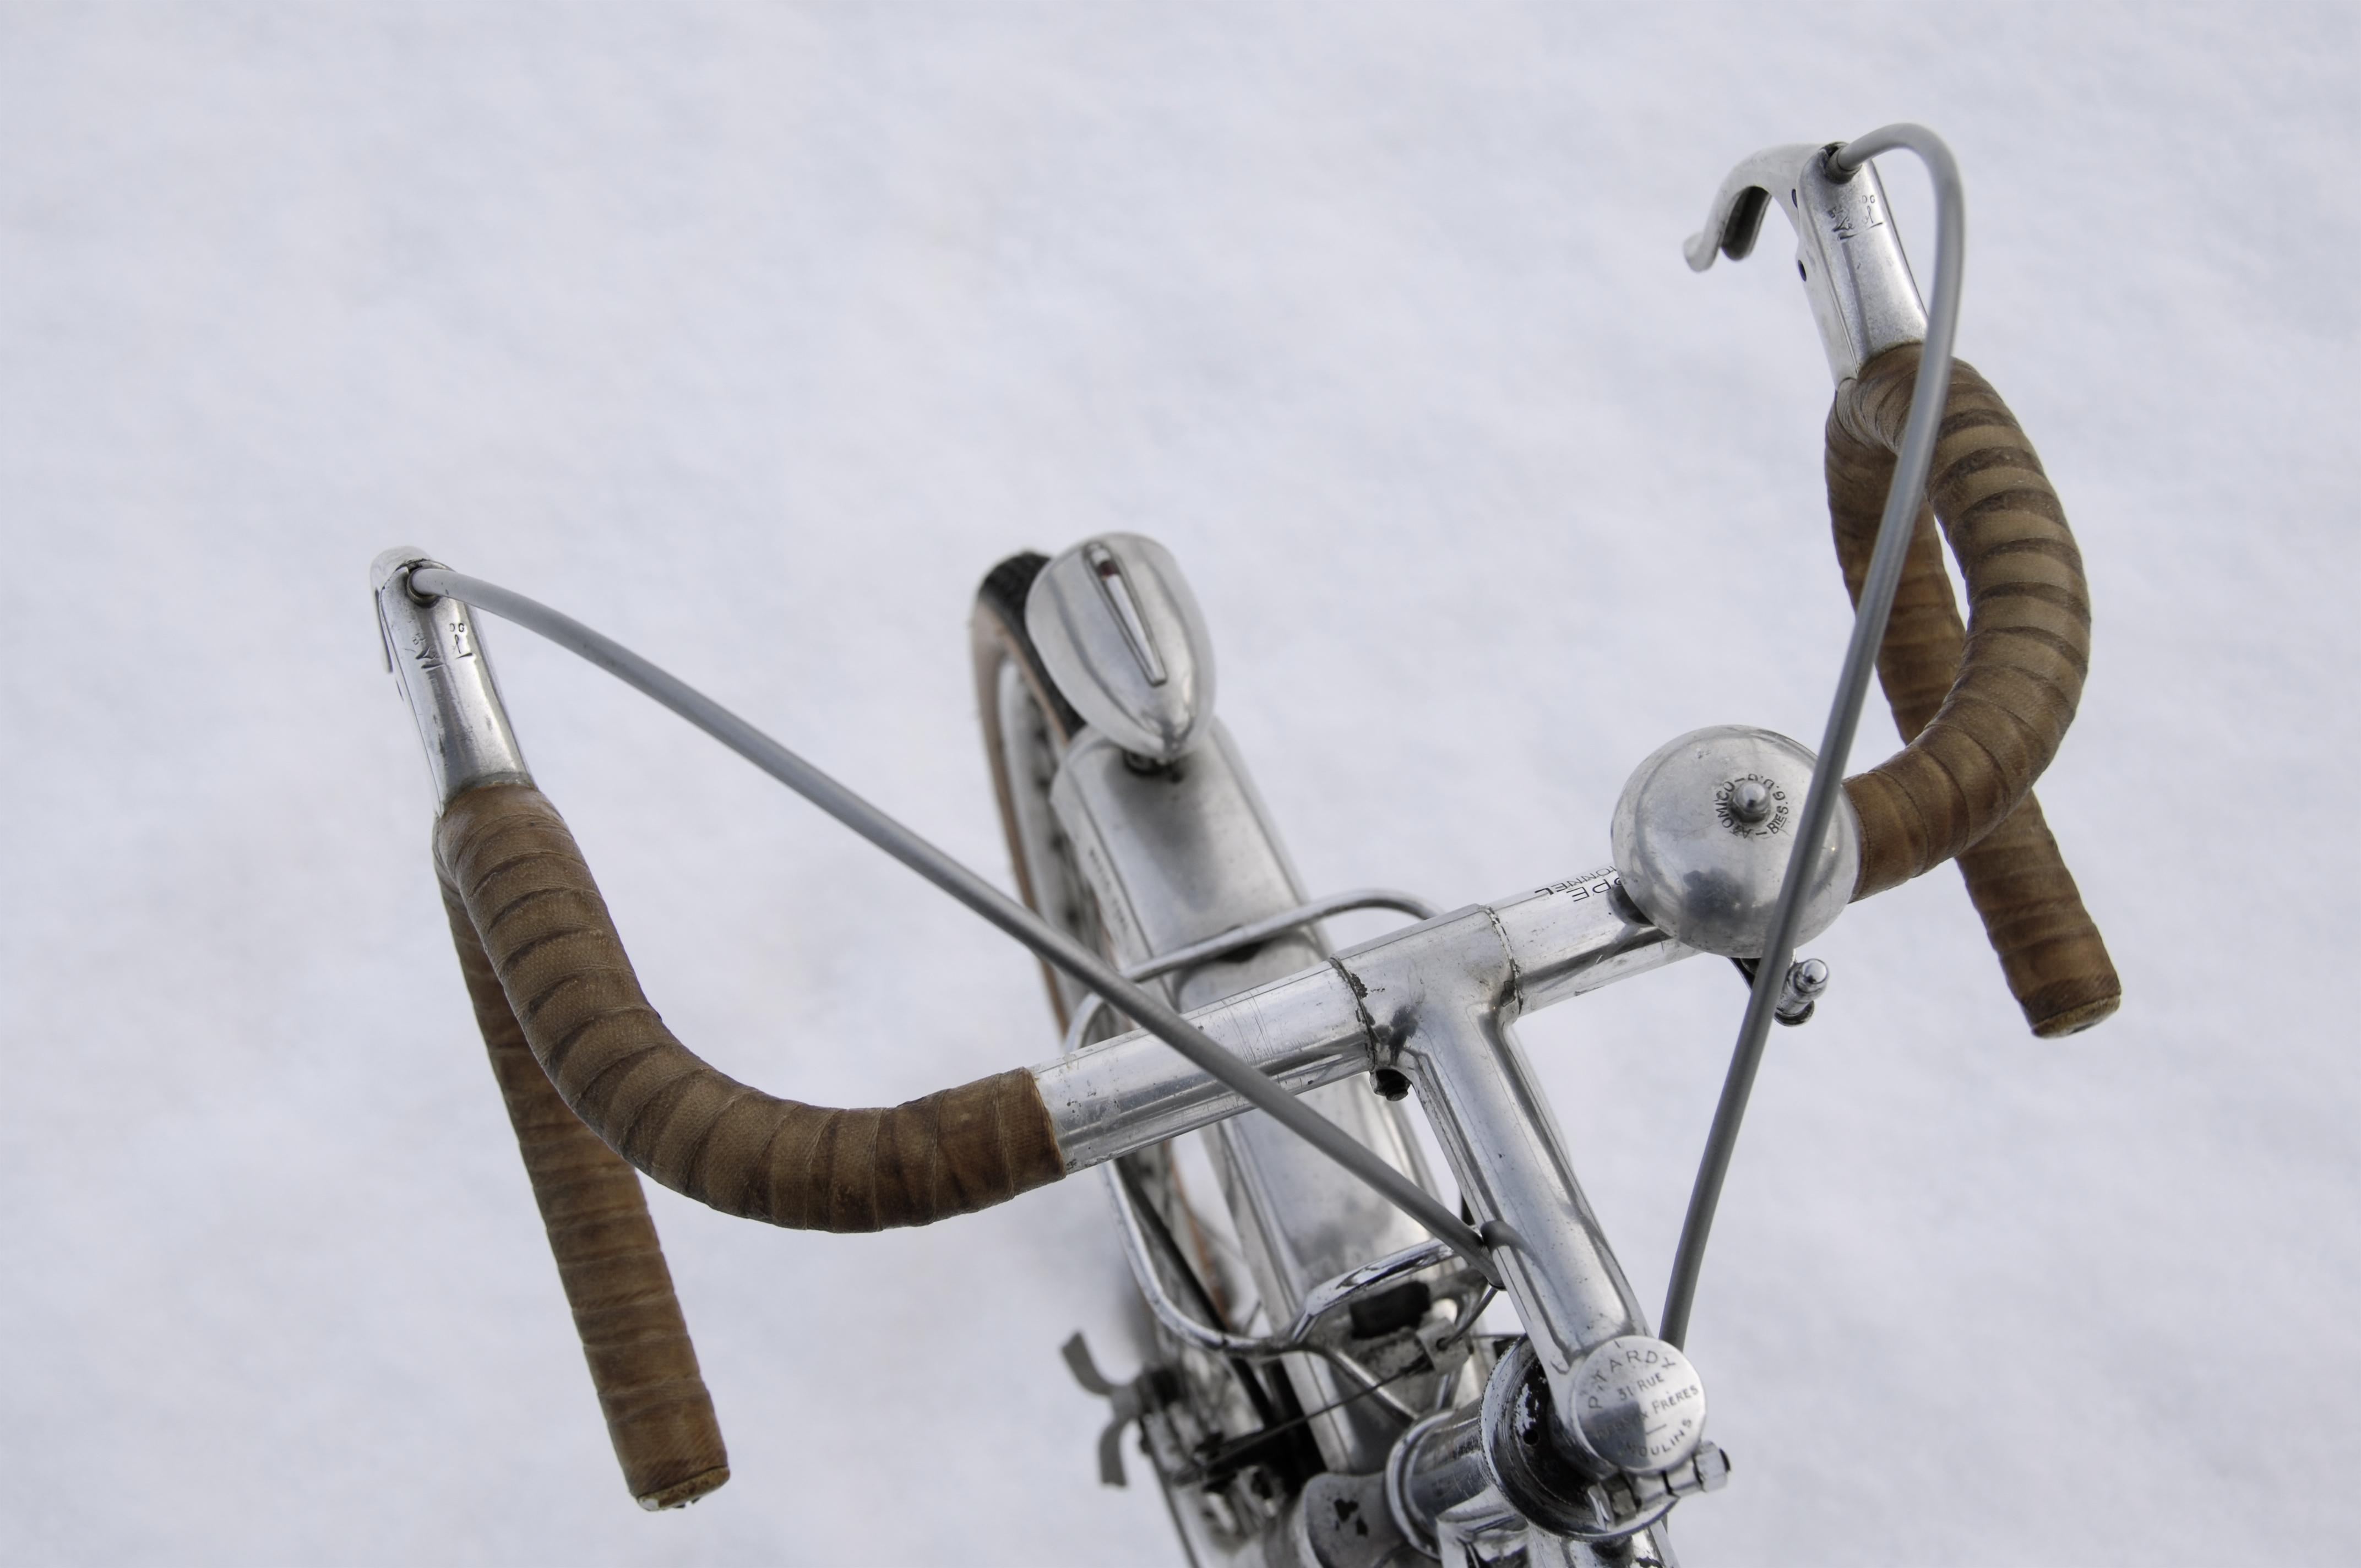 Vintage bicycles parts eBay